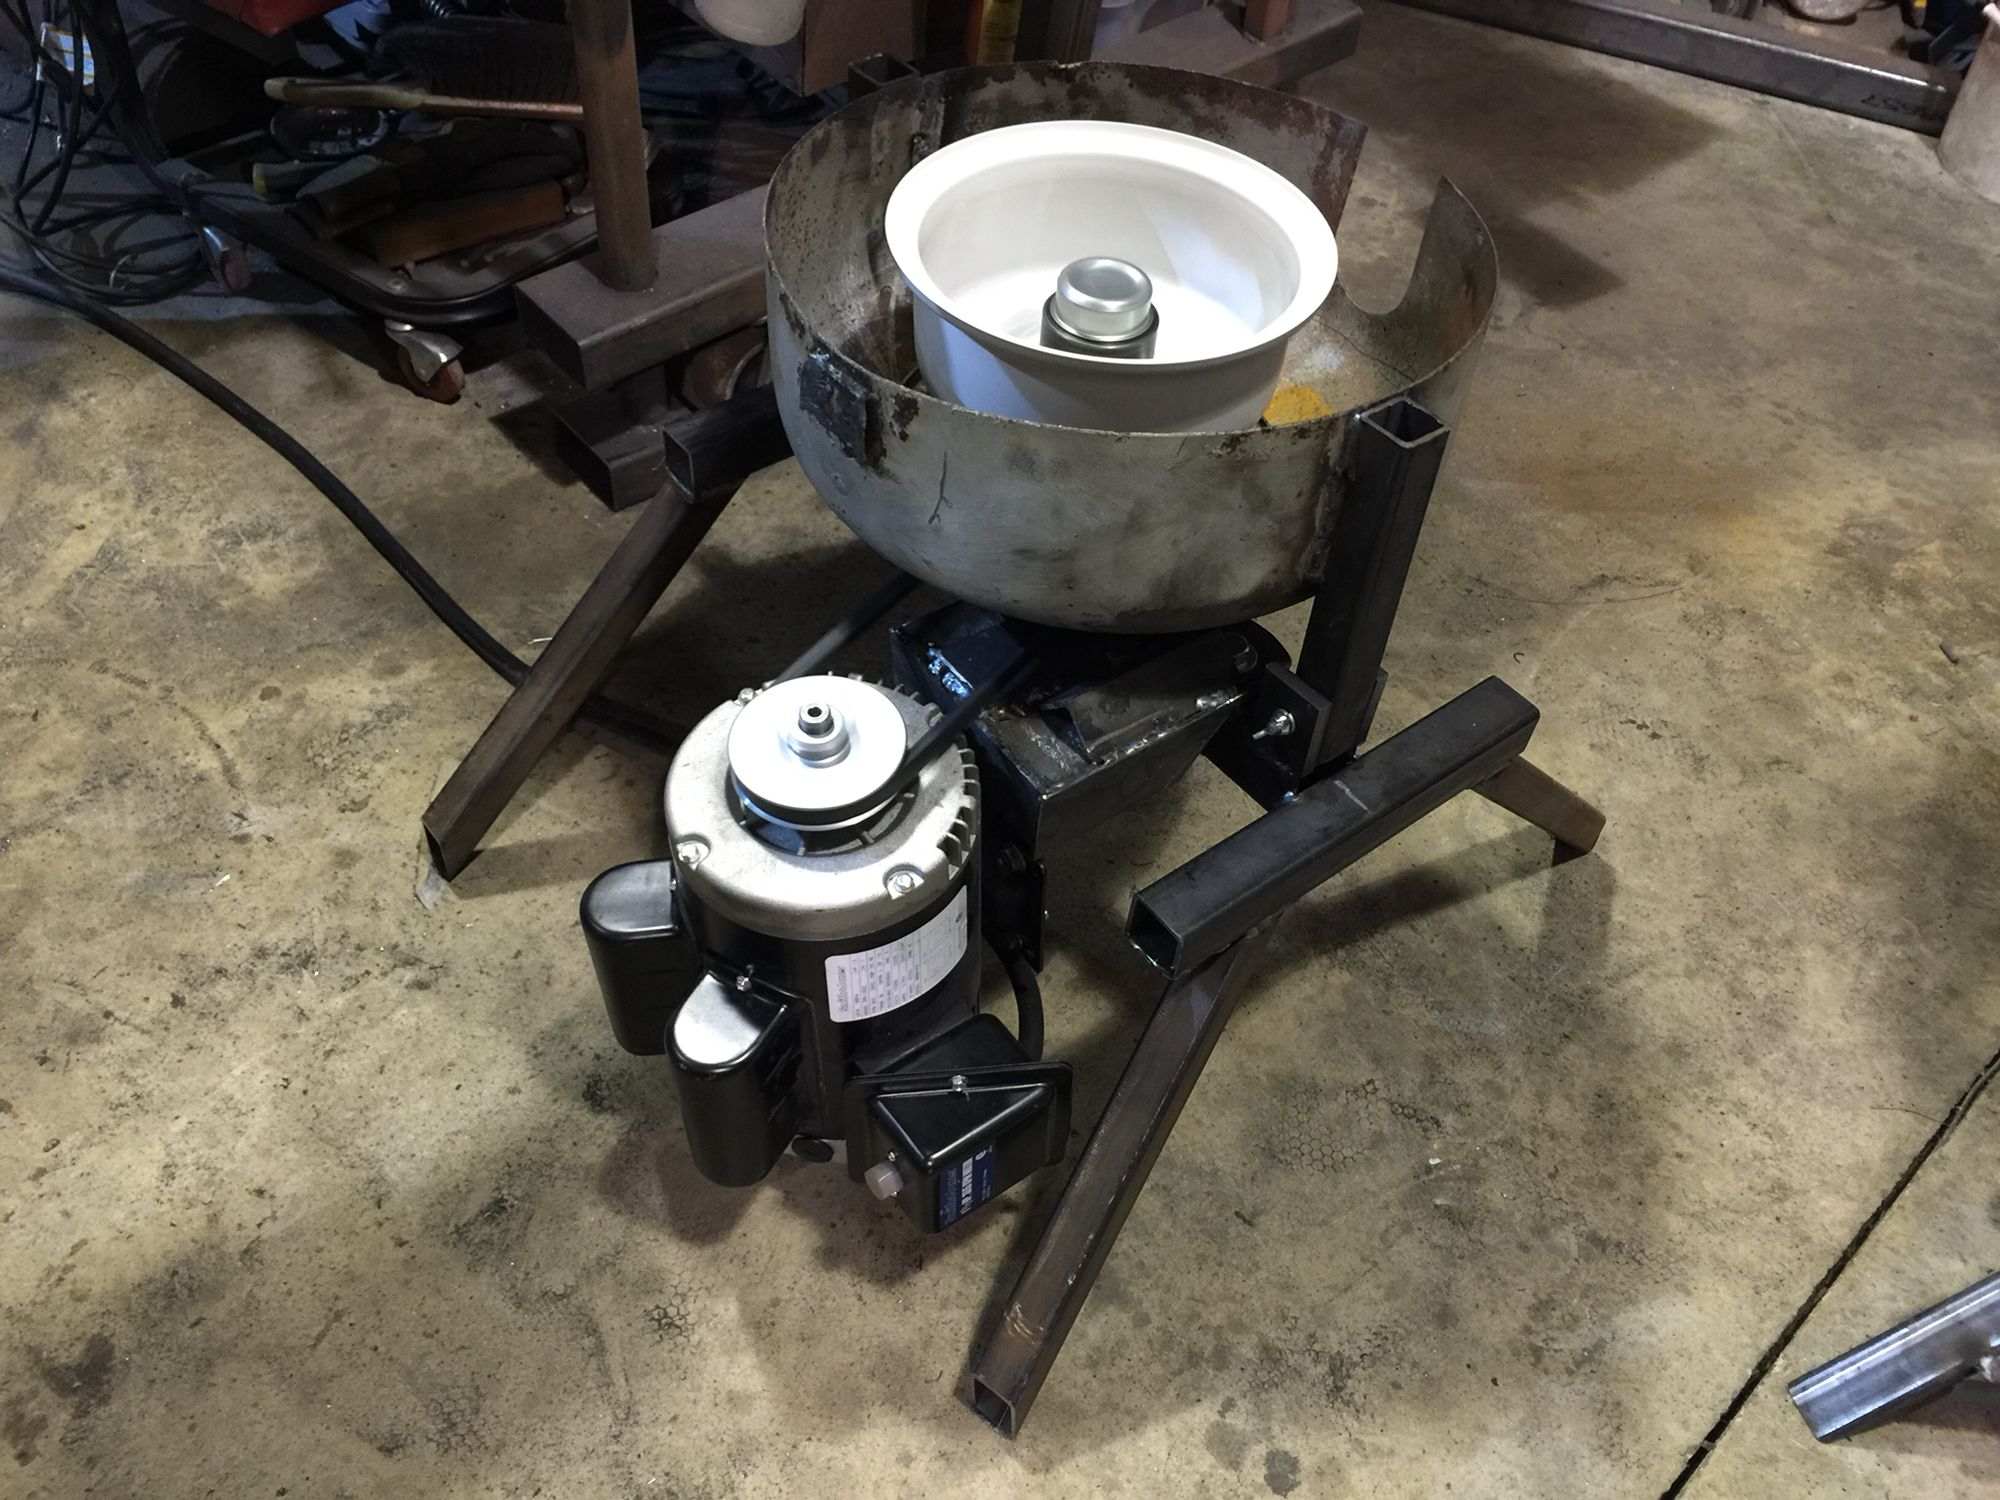 Homemade Waste Oil Centrifuge Test Spun Up Checking